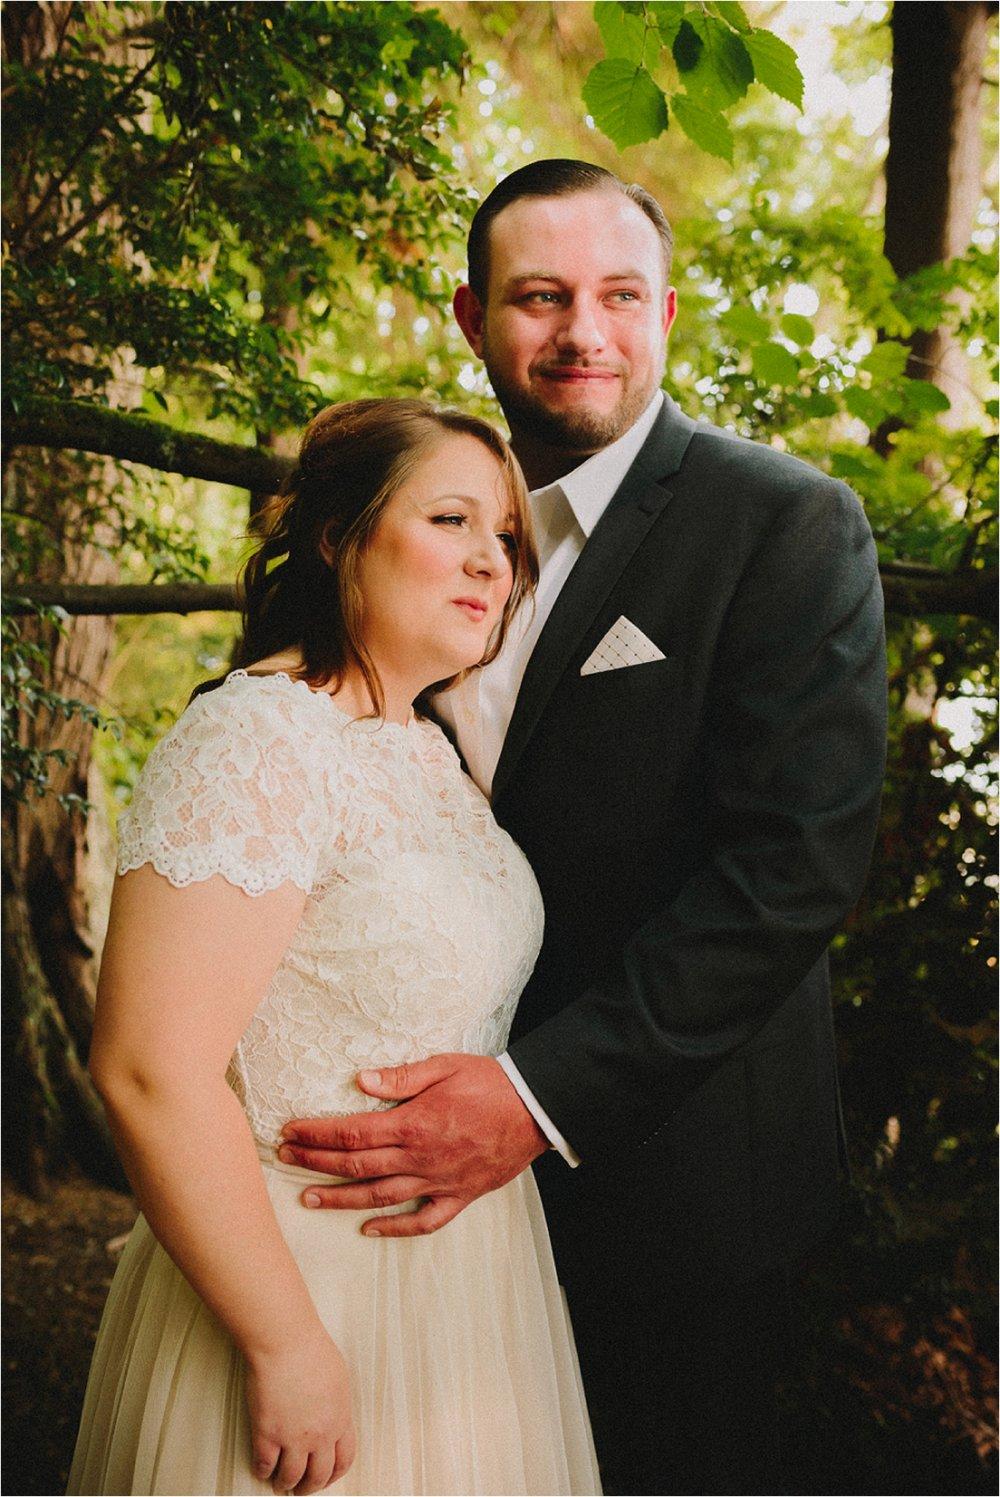 owen-beach-priest-point-park-tacoma-washington-elopement-jannicka-mayte-anchorage-alaska-wedding-elopement-photographer (4).jpg